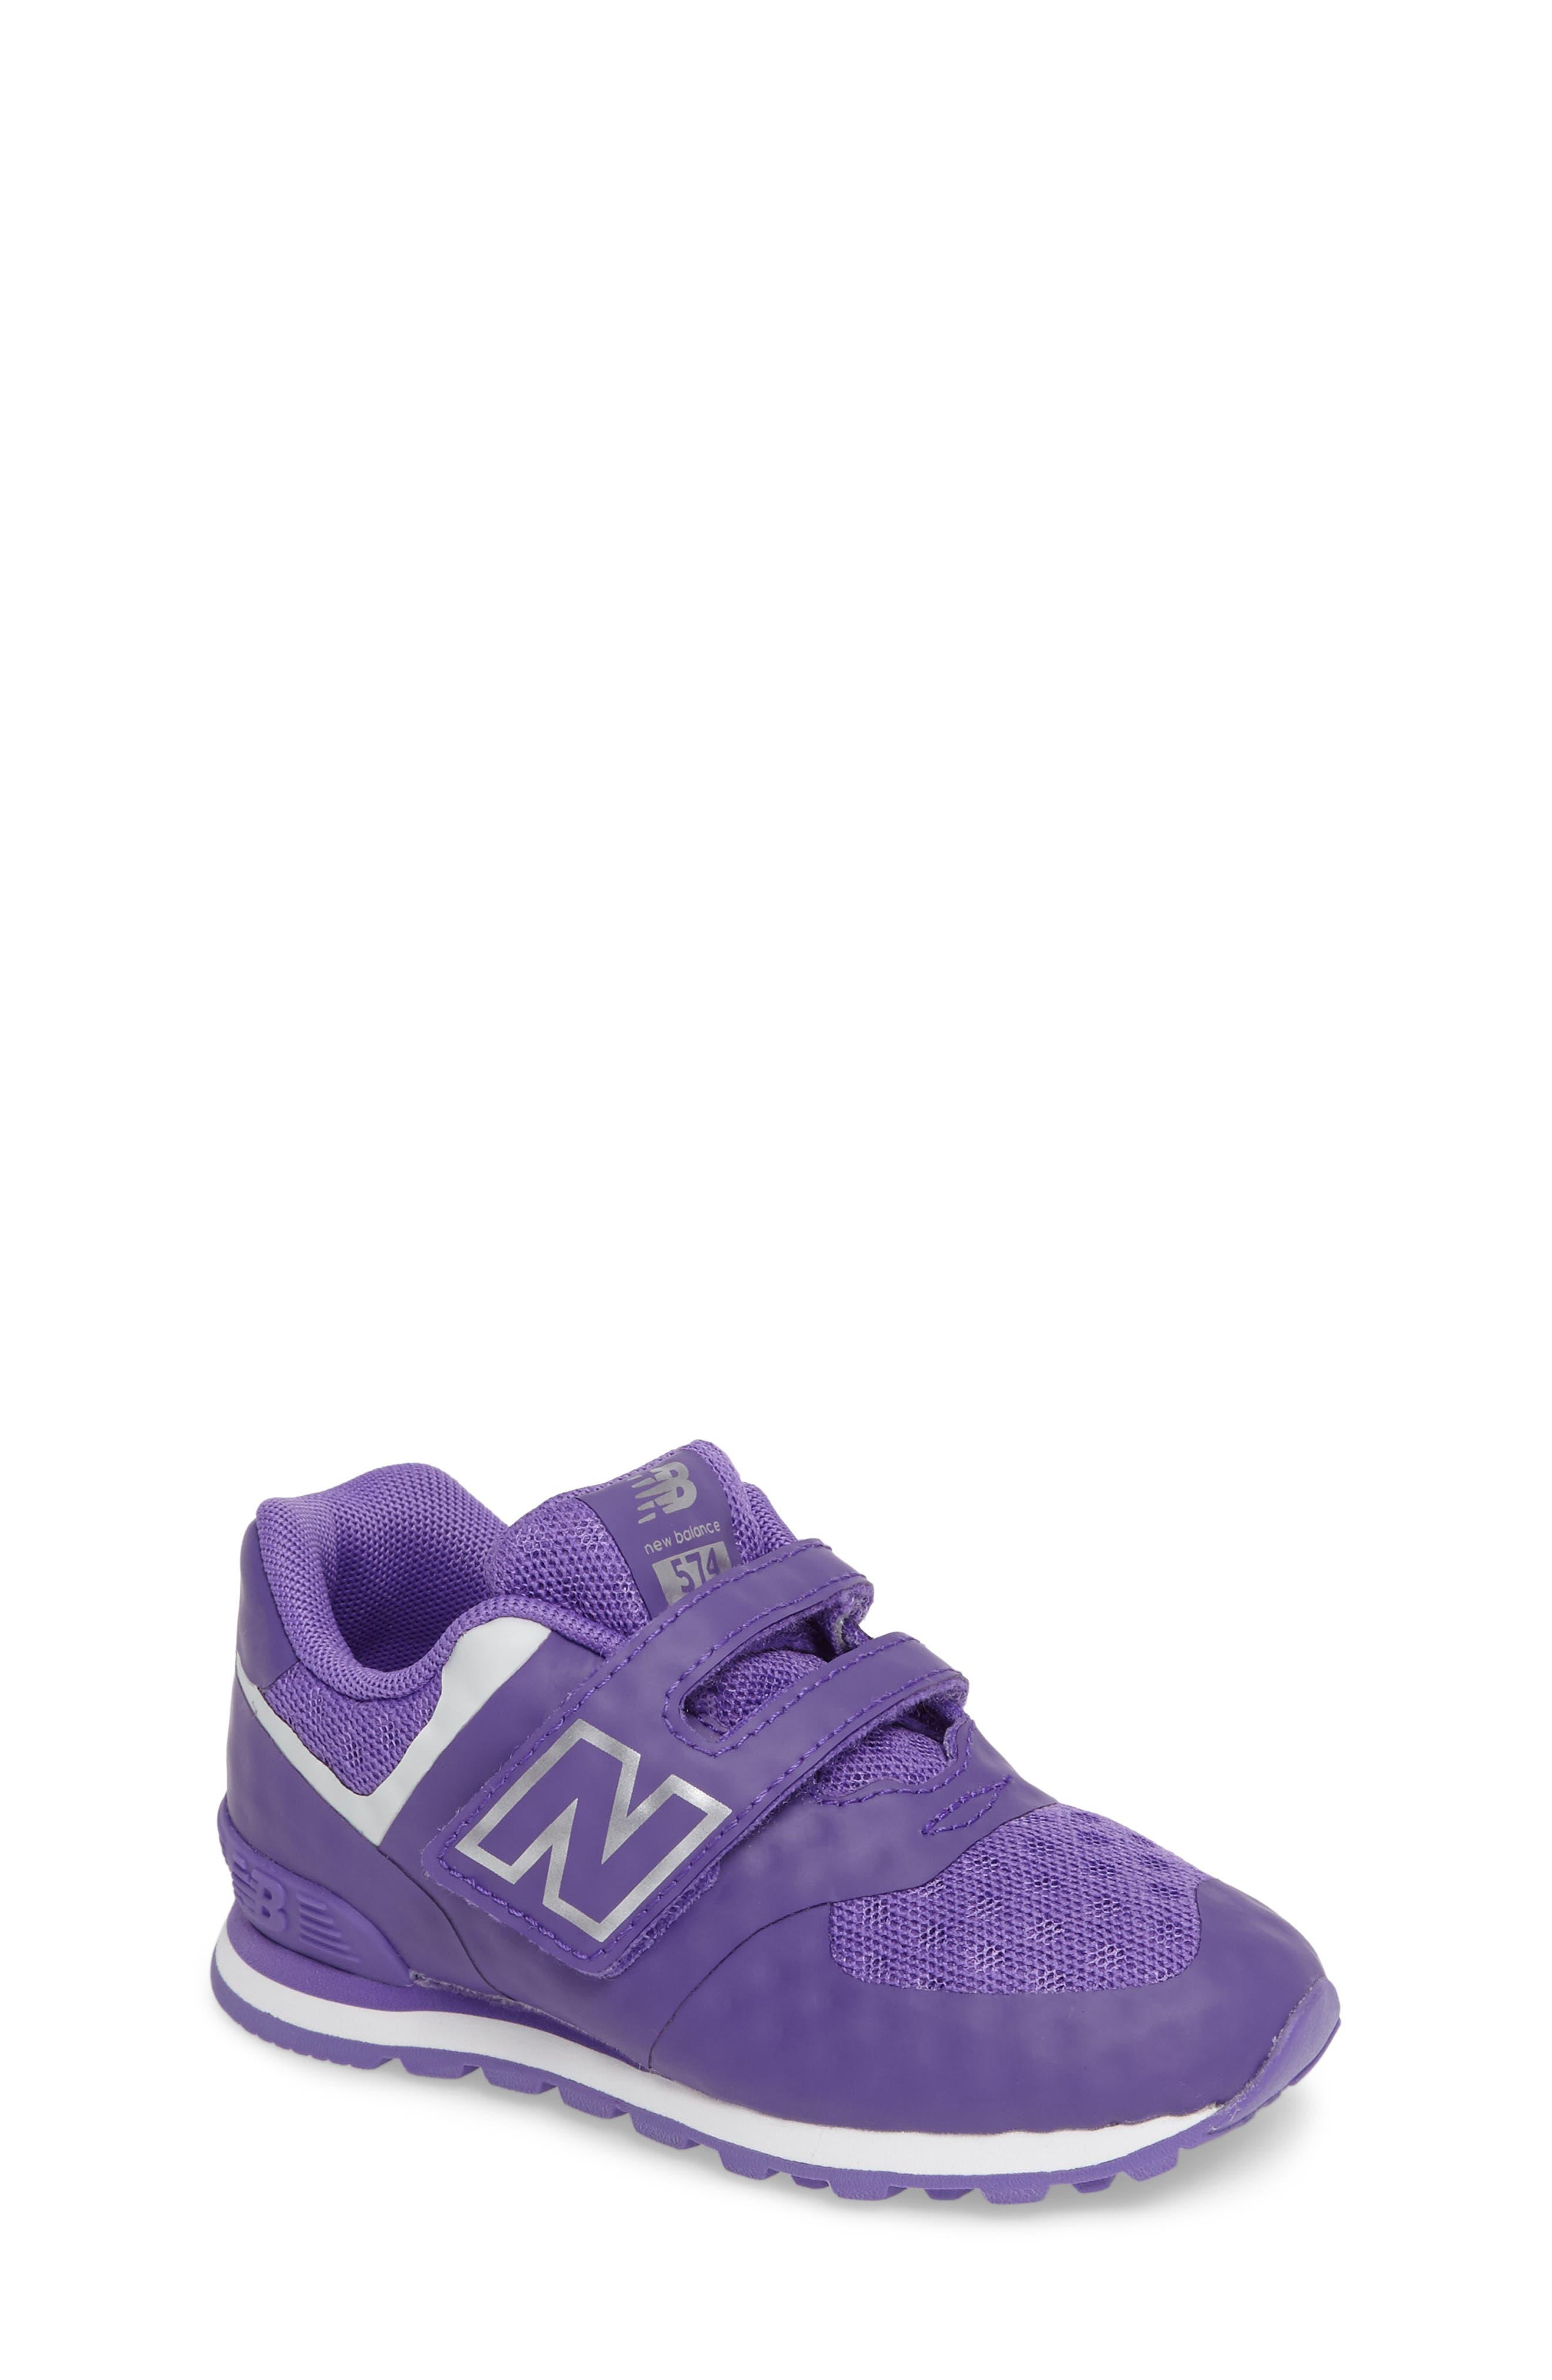 Alternate Image 1 Selected - New Balance 574 Sneaker (Baby, Walker, Toddler, Little Kid & Big Kid)